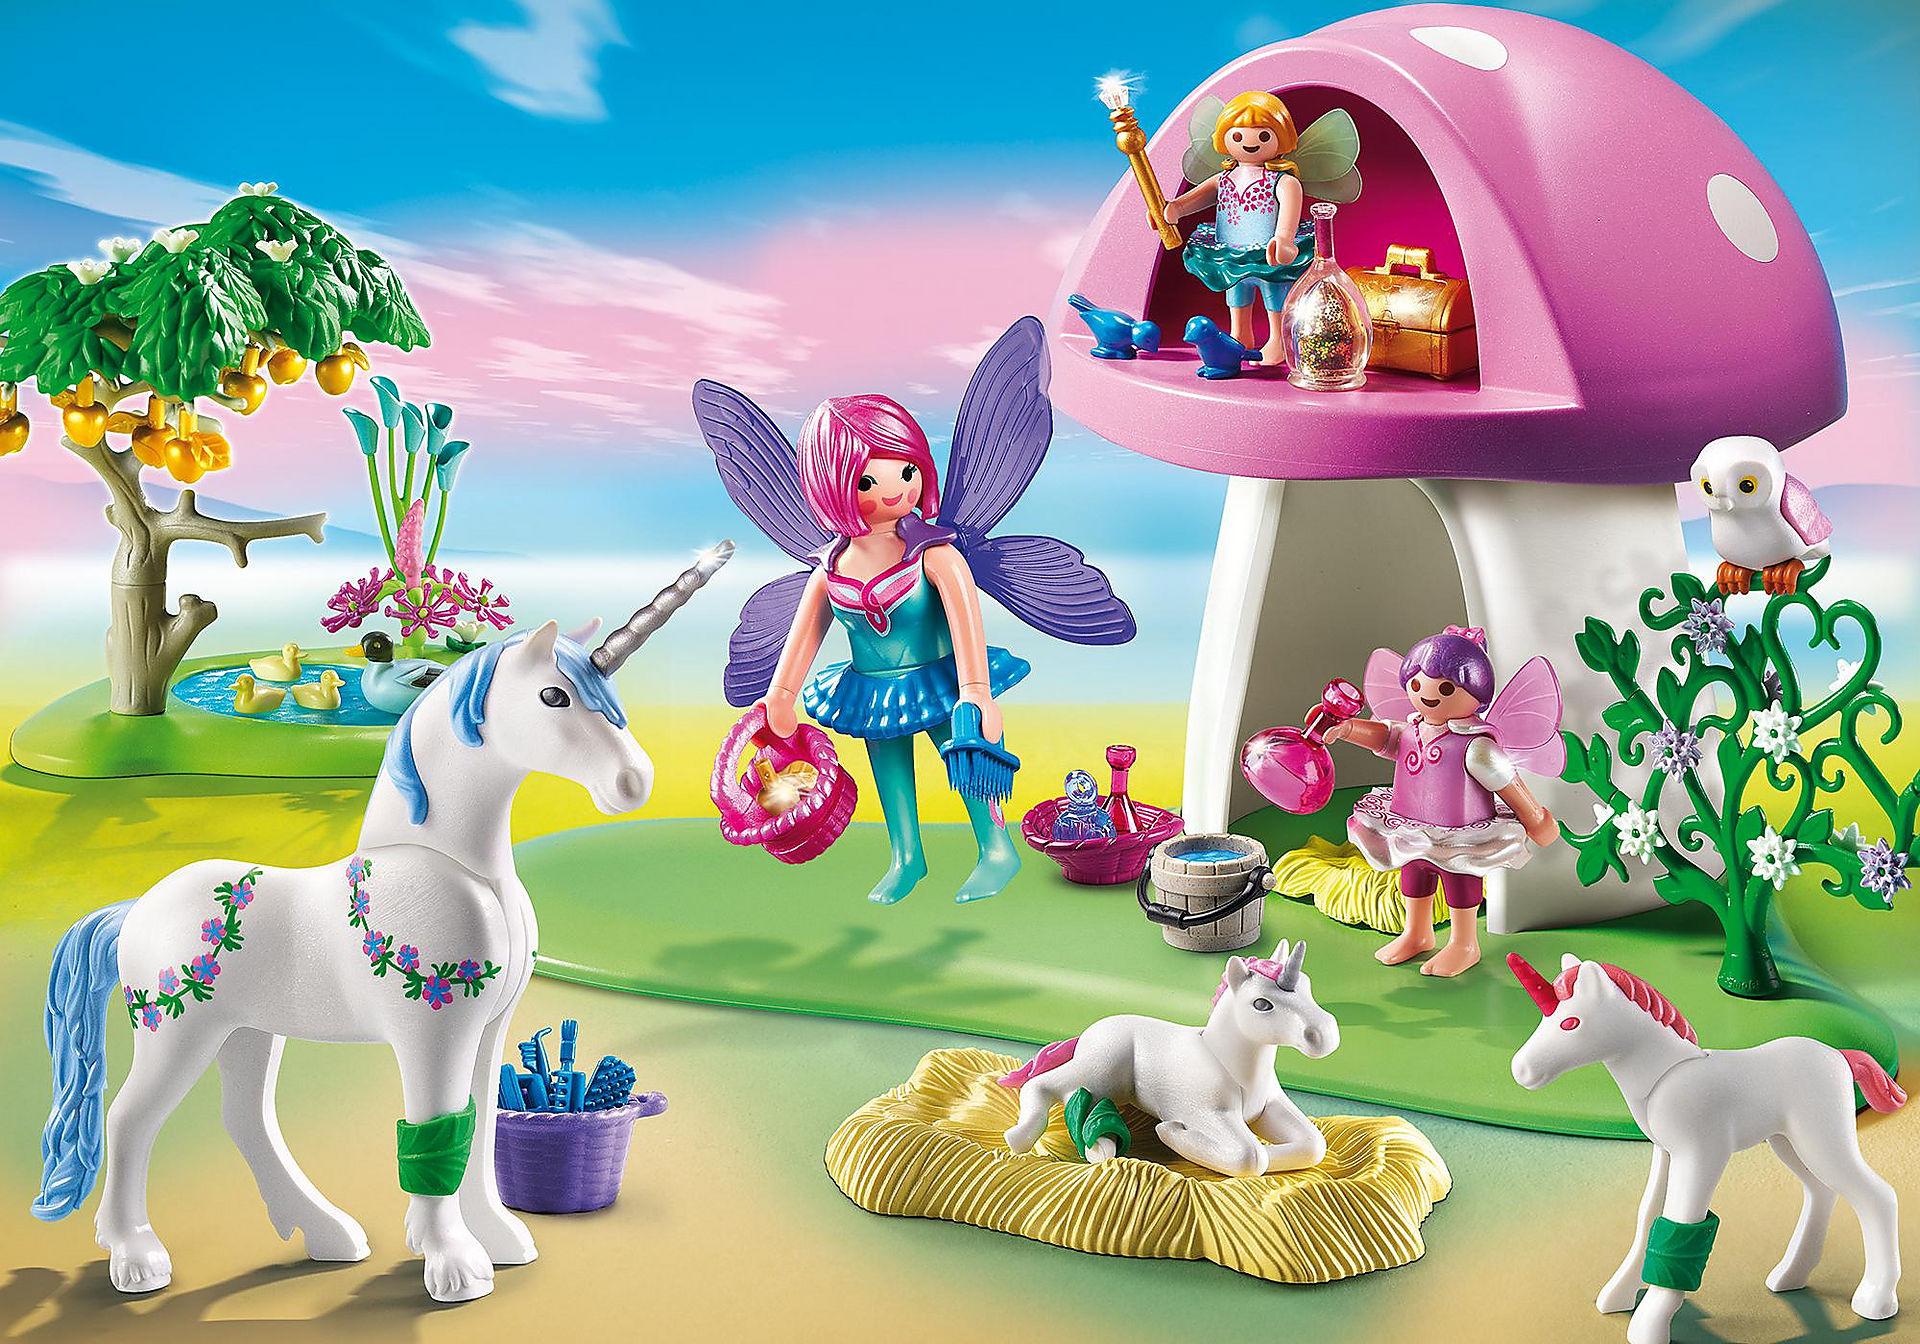 http://media.playmobil.com/i/playmobil/6055_product_detail/Centre de soins pour licornes